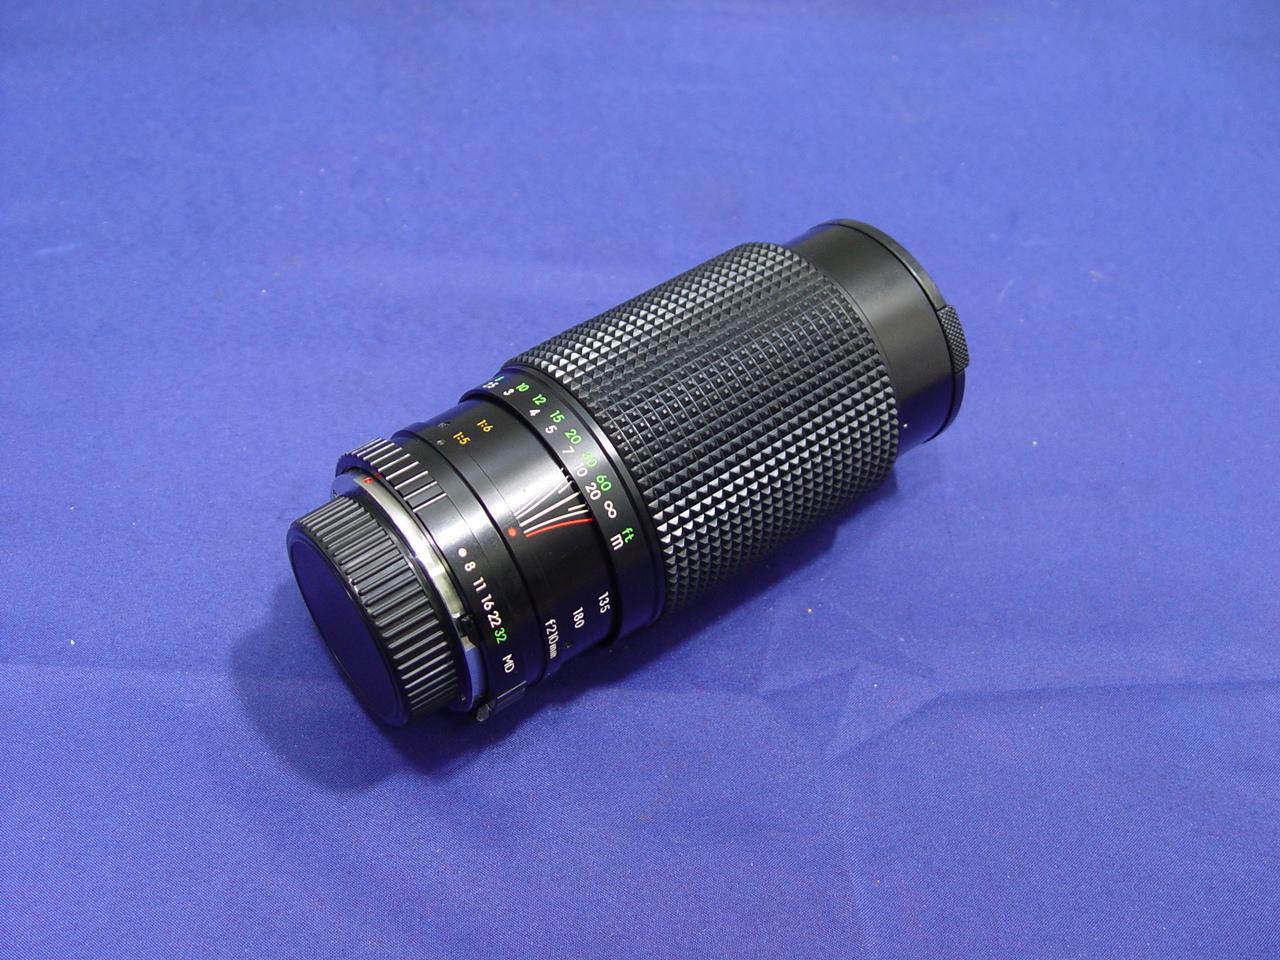 [W446] SAMSUNG 70 - 210mm F4.0 줌렌즈